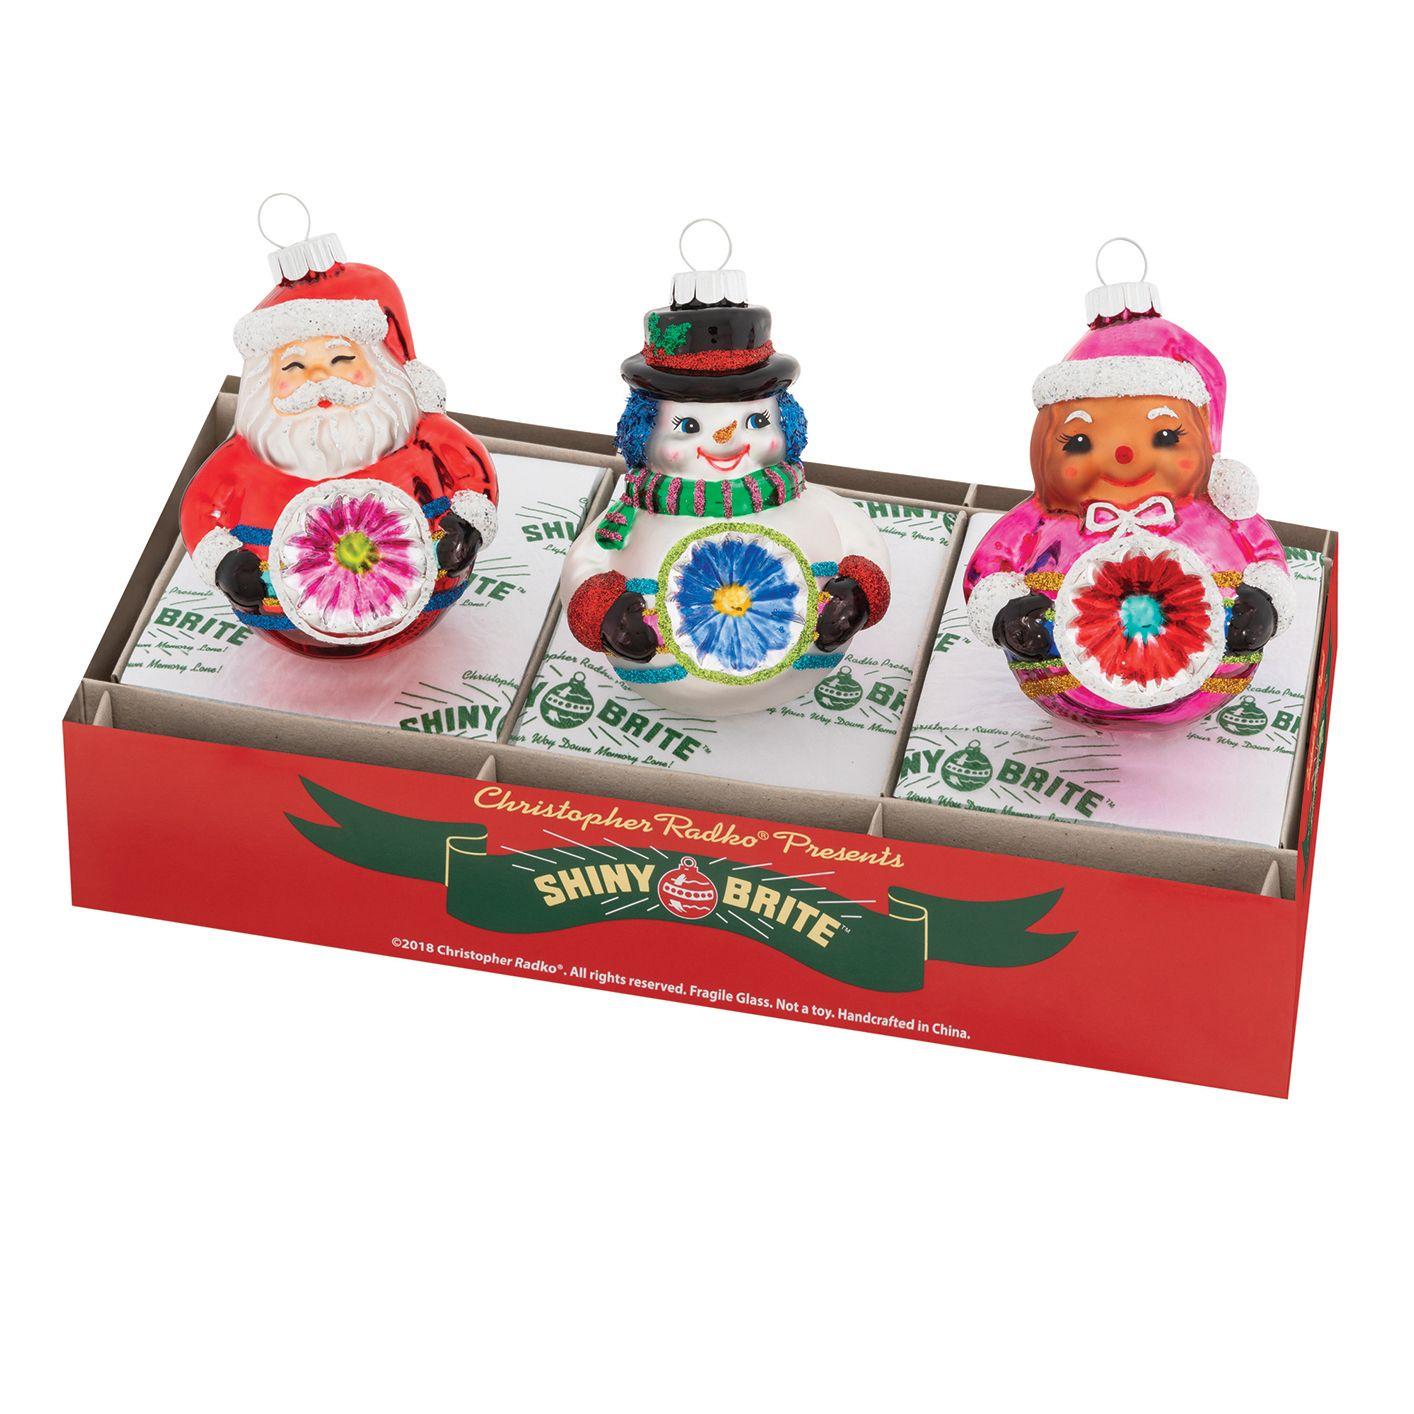 "Christmas Confetti 3.25"" Figures by Christopher Radko (Set"